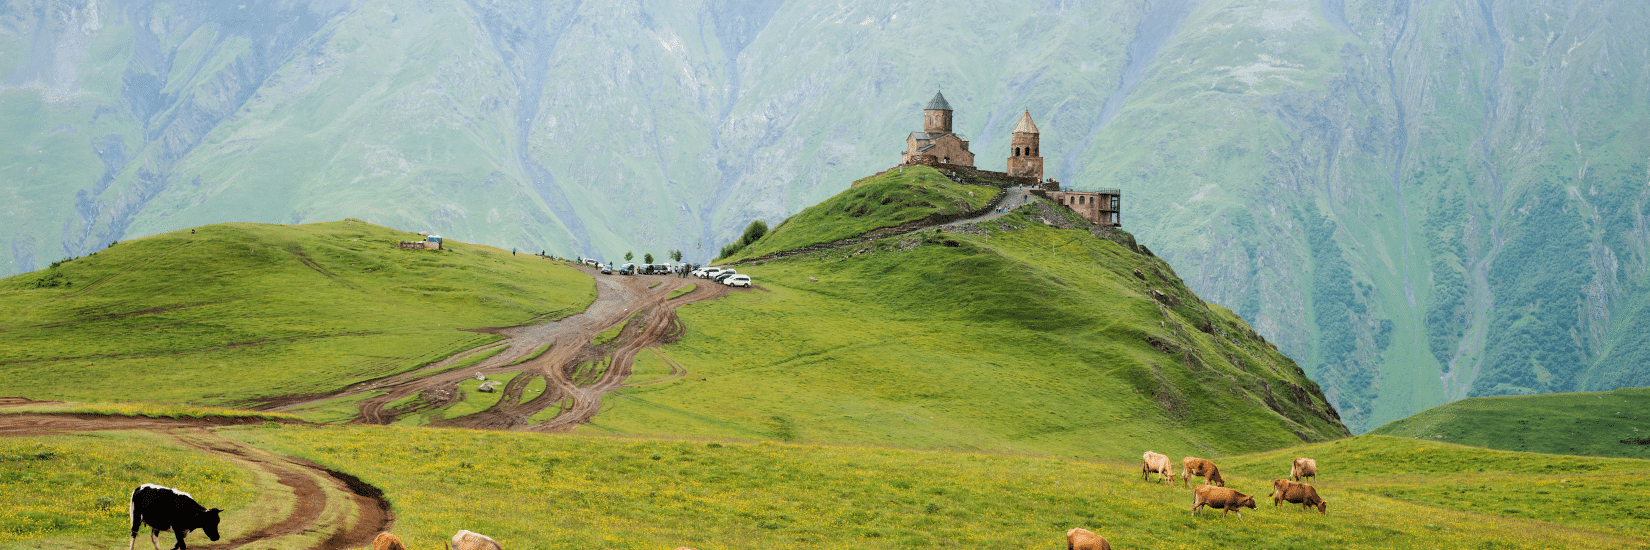 Kaukasus - Rondreis Kaukaus - Georgië - Mevo Reizen